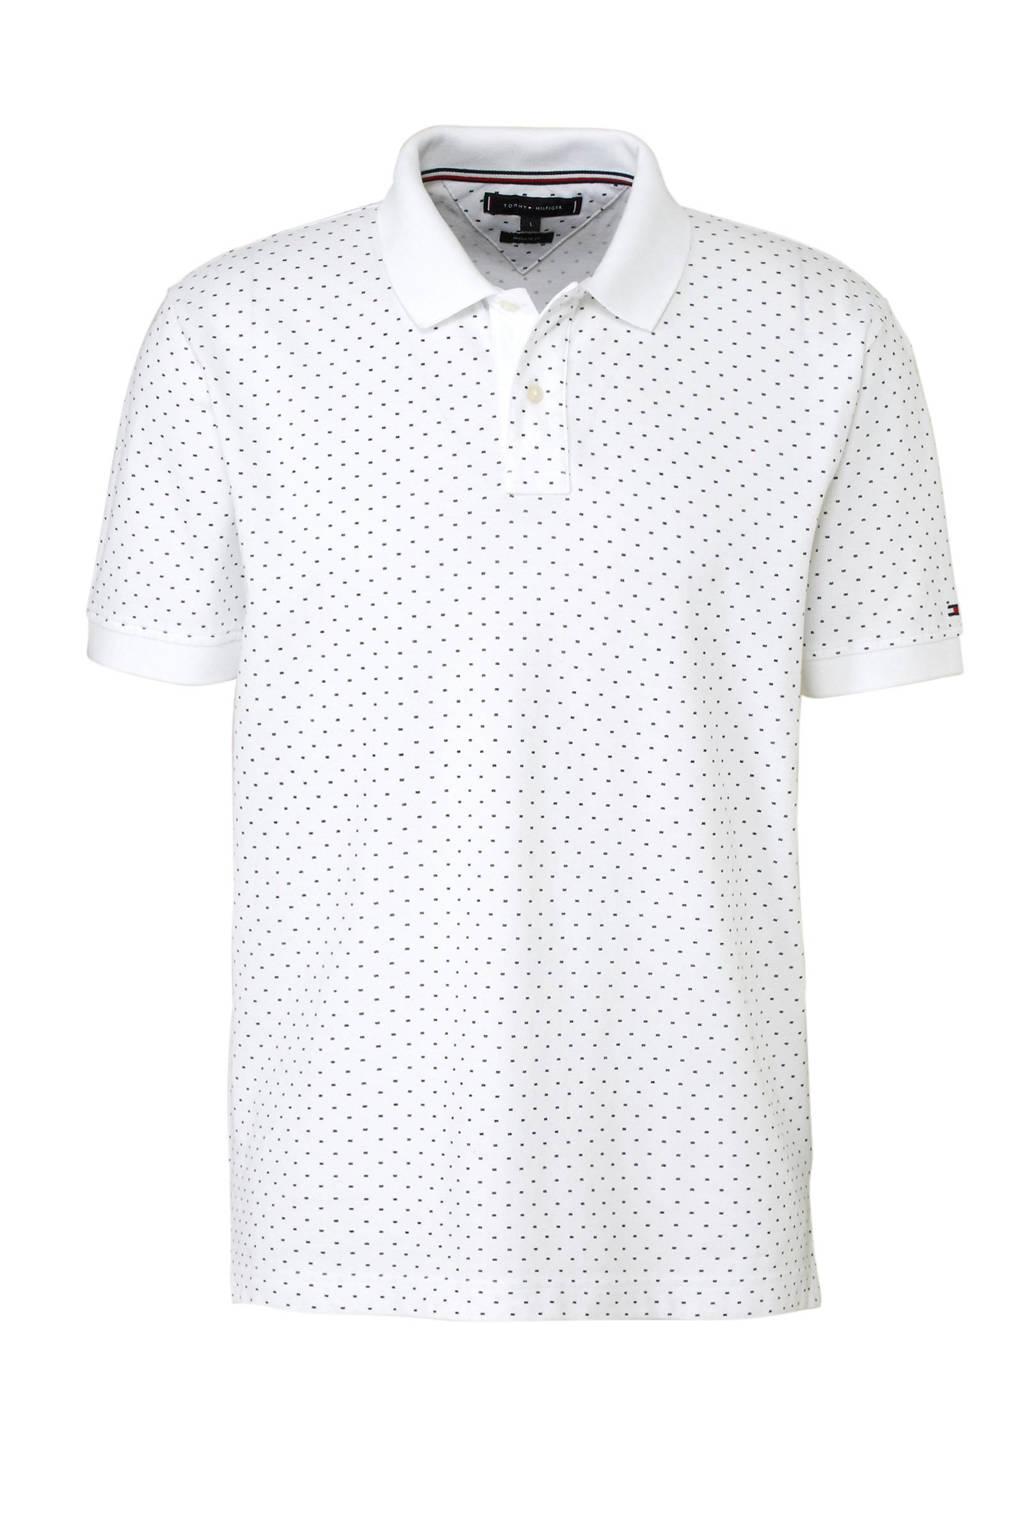 Tommy Hilfiger regular fit polo met print wit, Wit/zwart